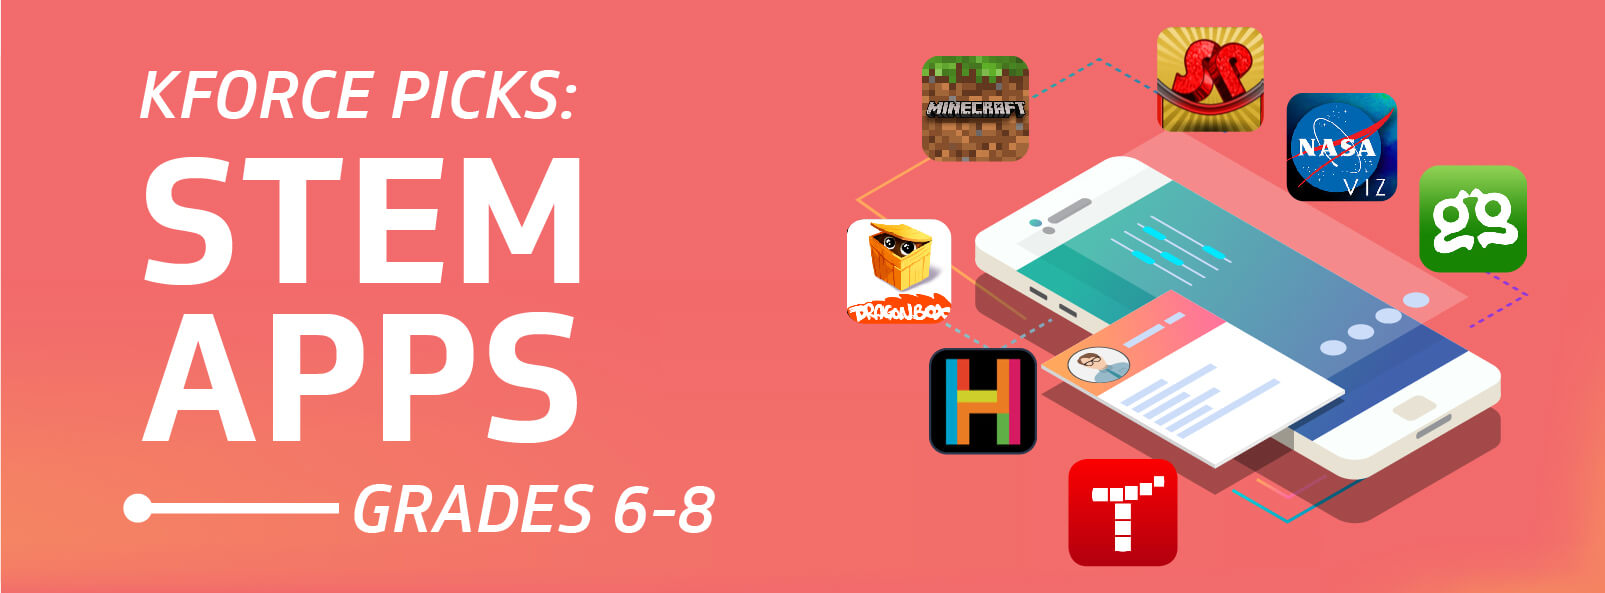 Kforce Picks Top STEM Apps Grades 6-8